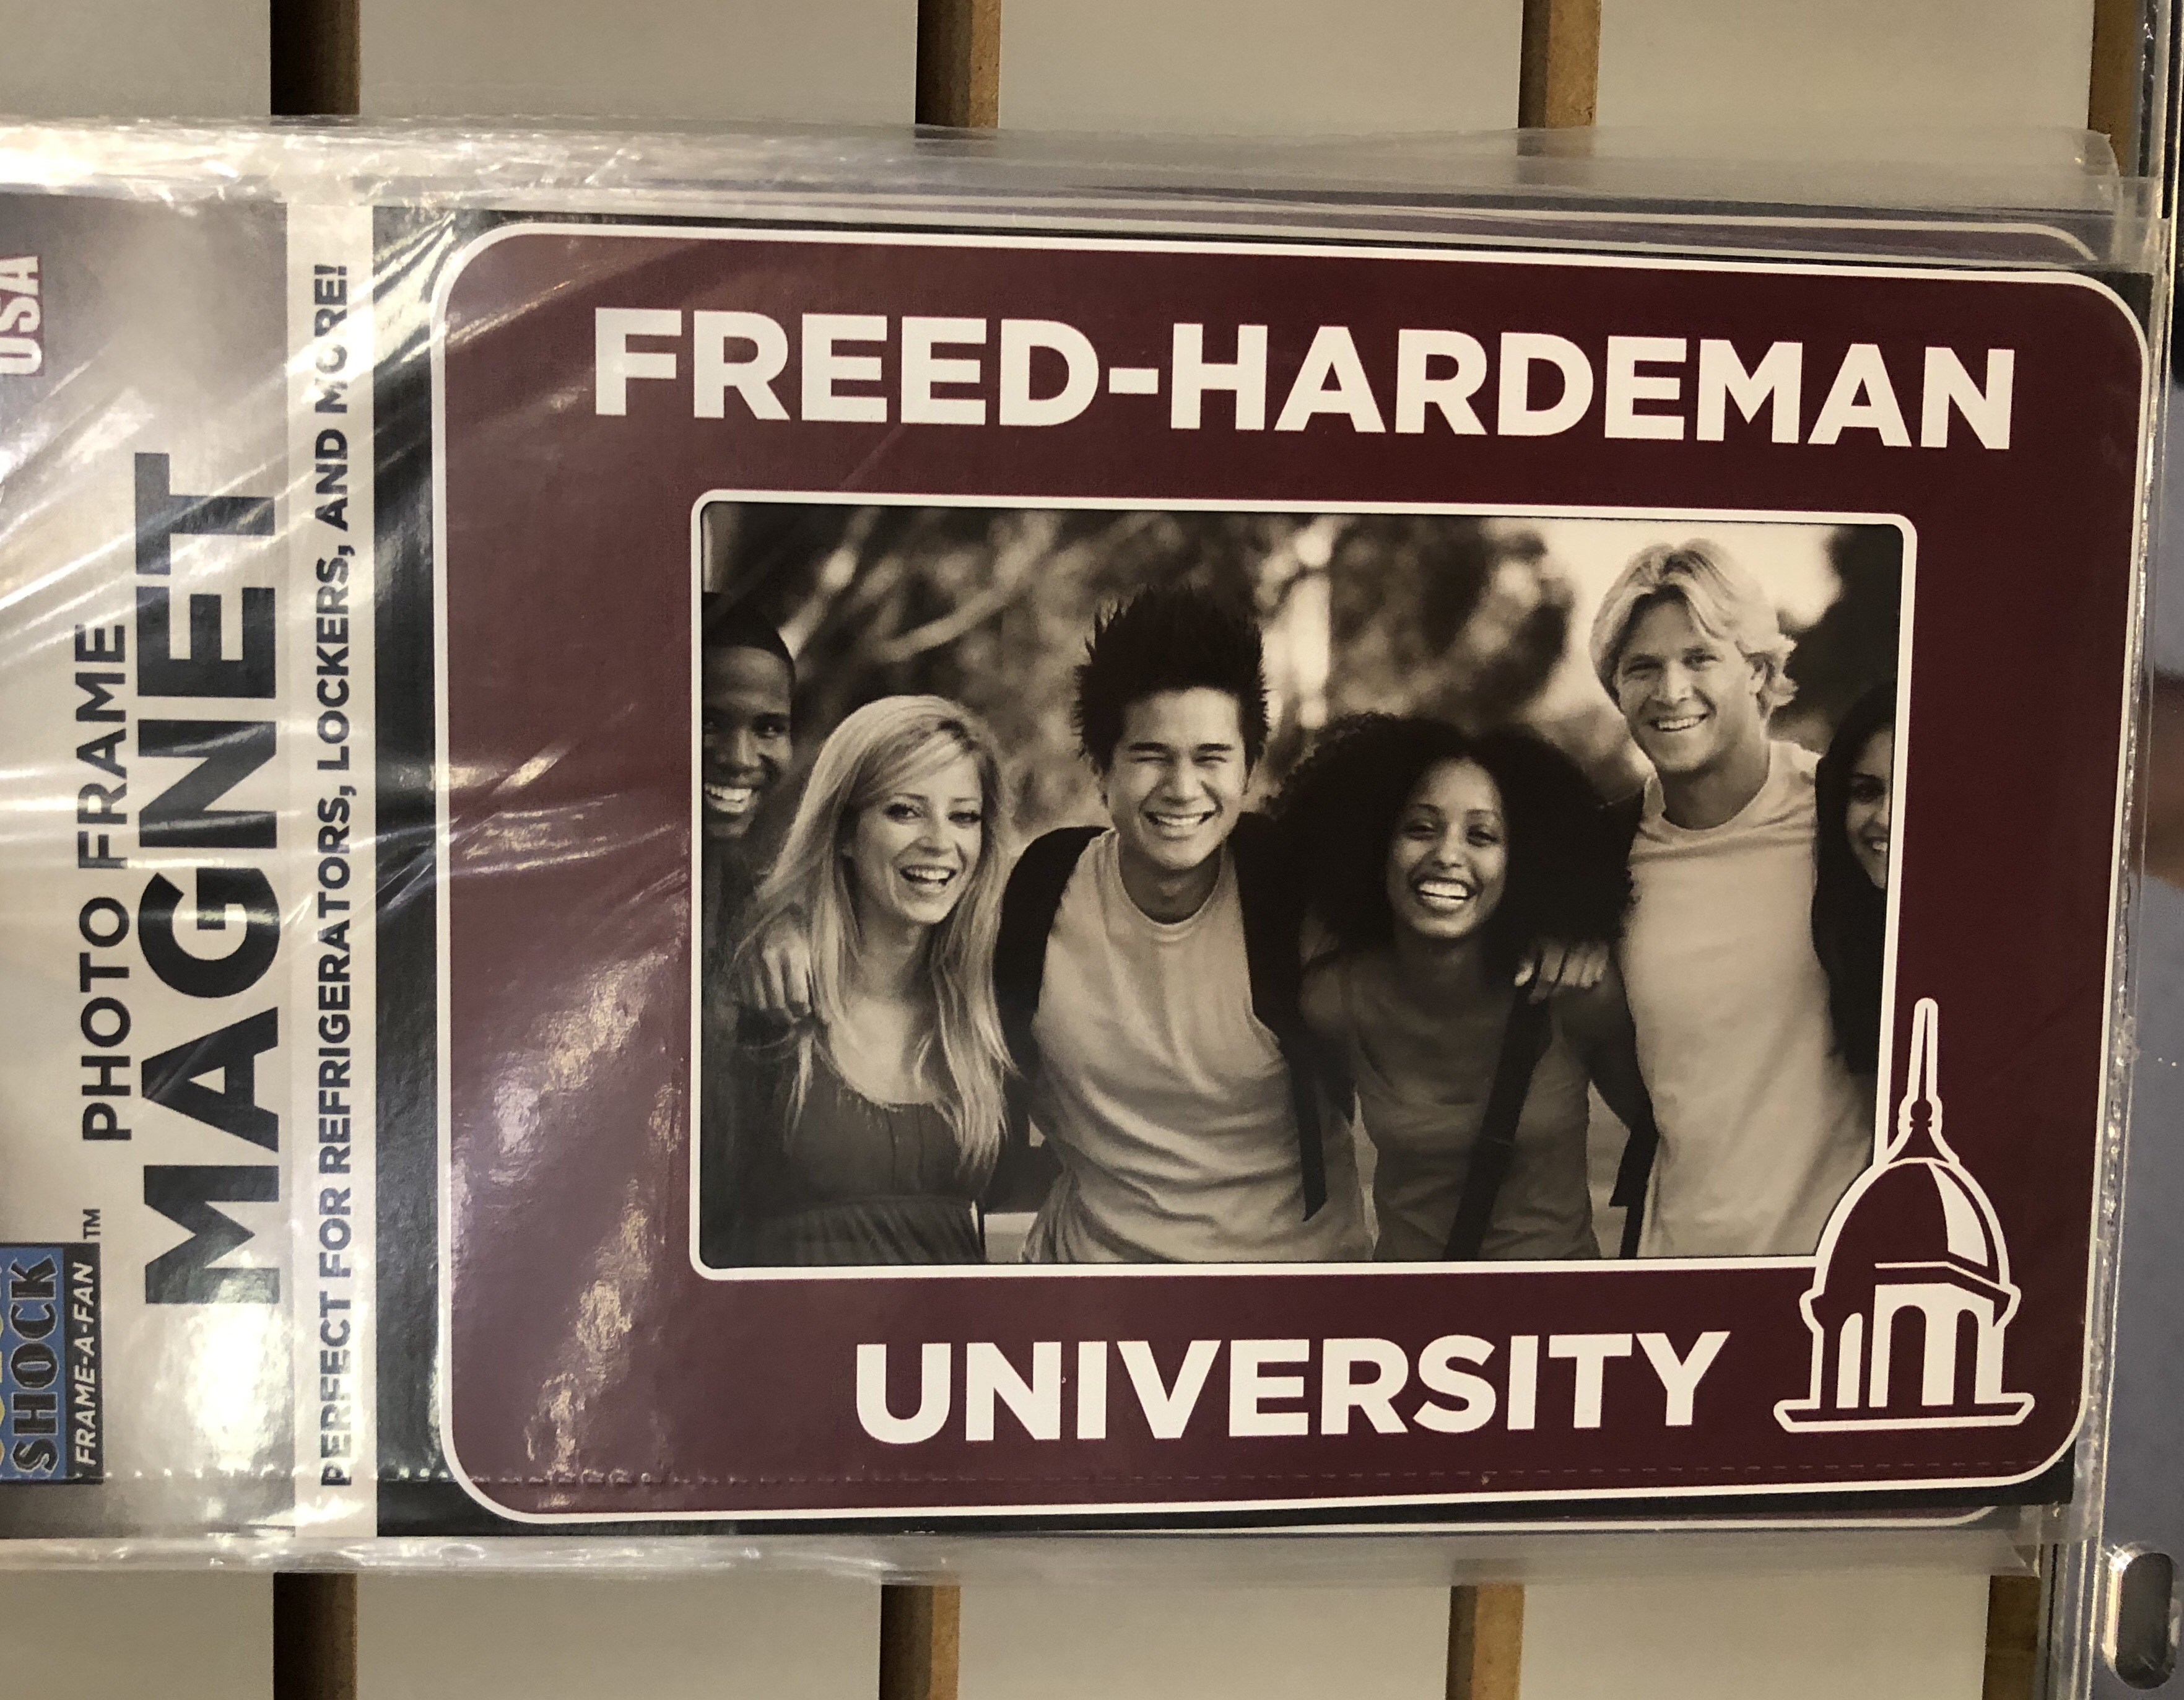 Freed-Hardeman University Magnet Frame